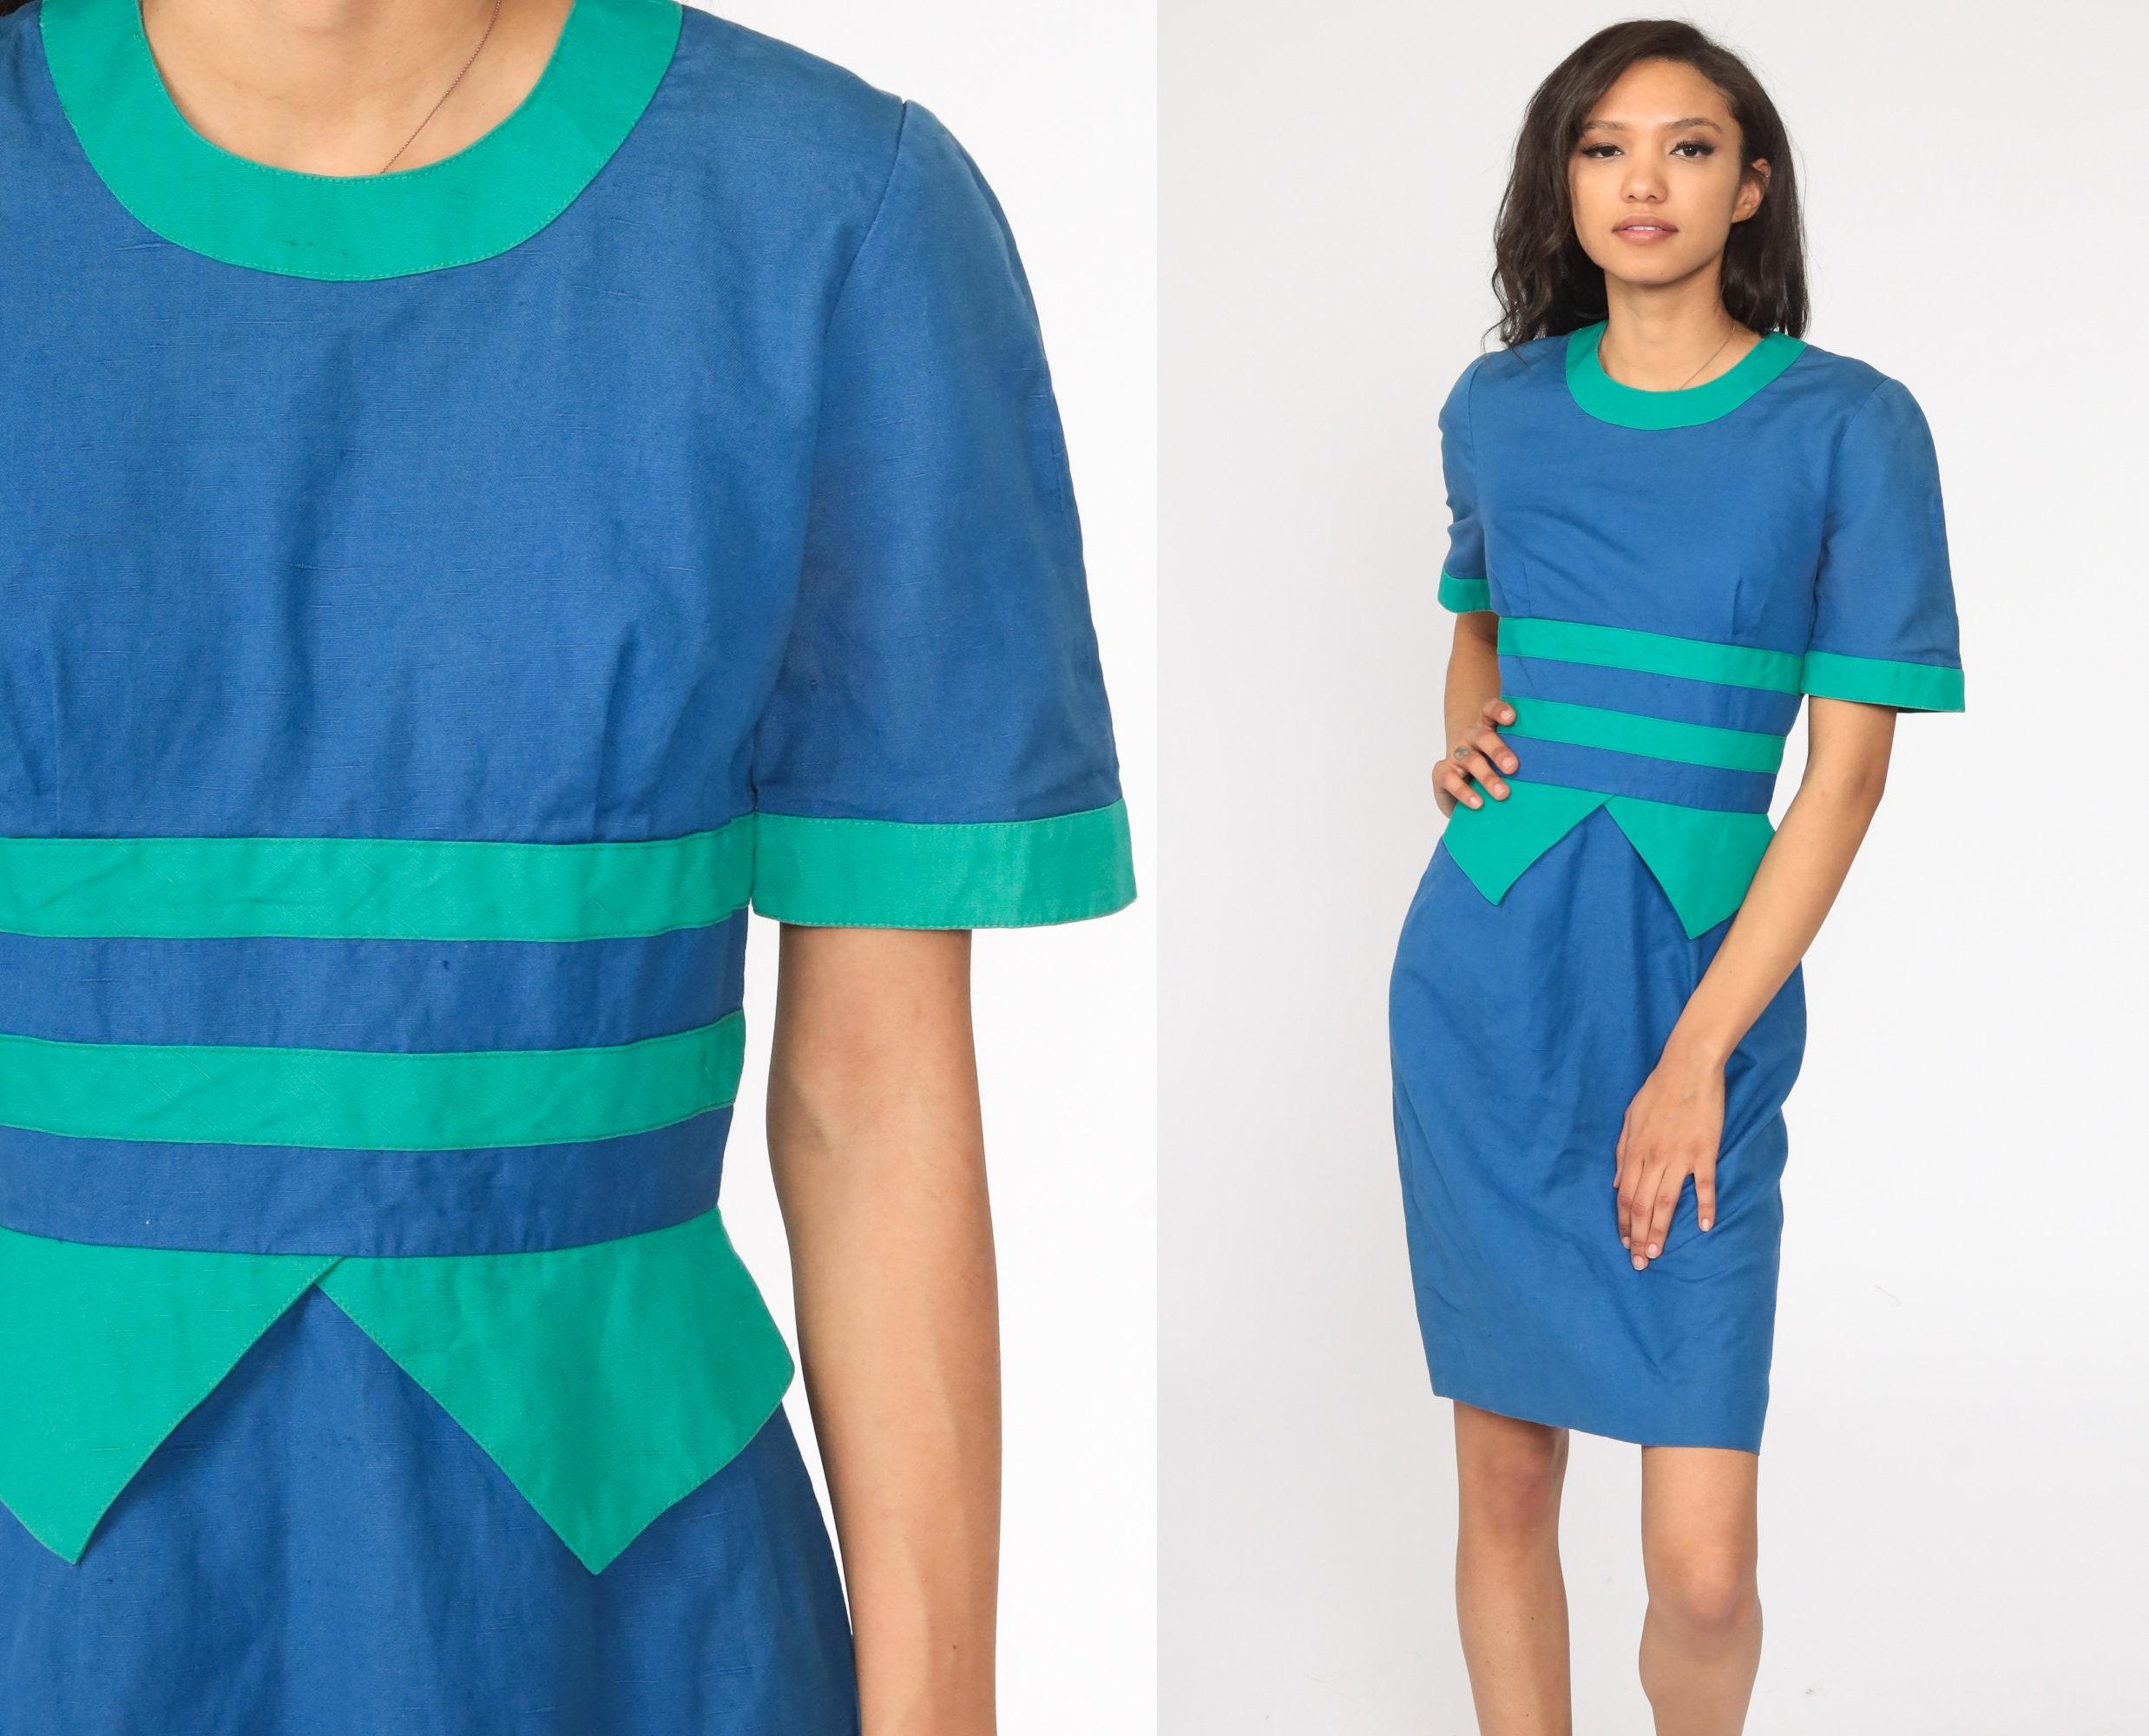 80s Dresses | Casual to Party Dresses Blue Striped Dress 80S Pencil Midi Secretary High Waist Peplum Green Wiggle 1980S Vintage Short Sleeve Small S $5.95 AT vintagedancer.com